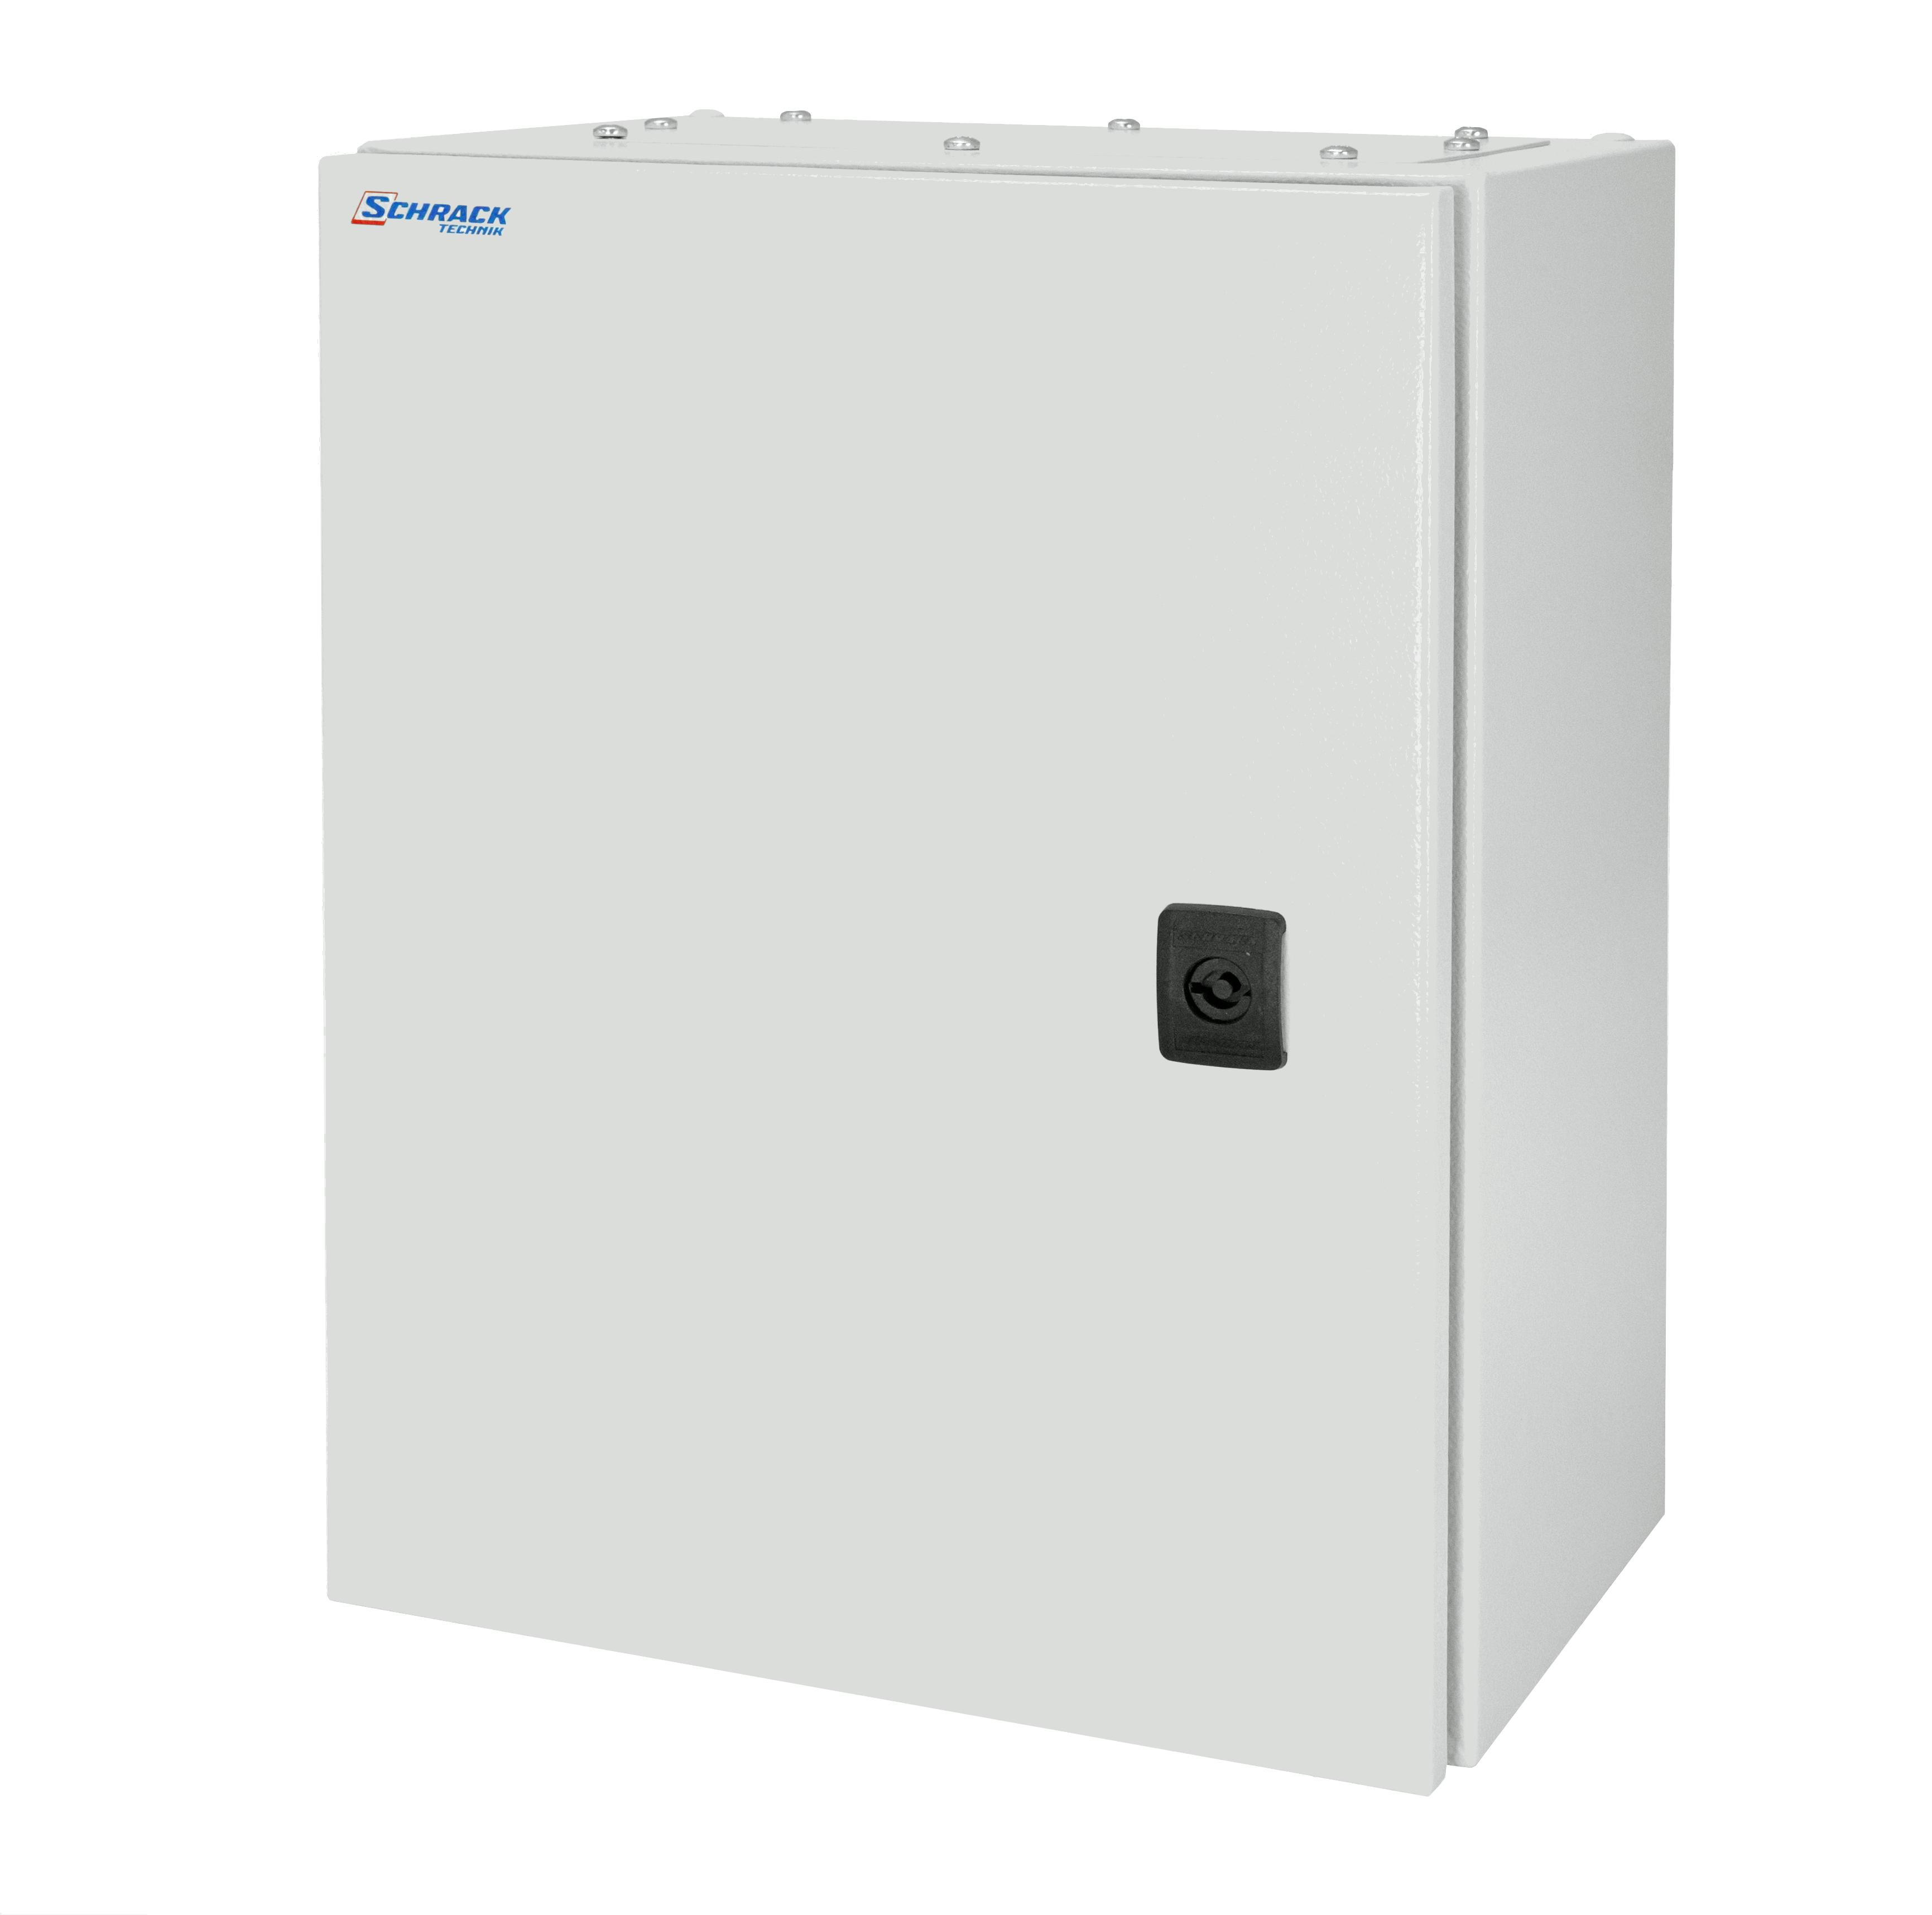 1 Stk Wandschrank Mono IP66 H=1000 B=800 T=300 Stahlblech WSM1008300